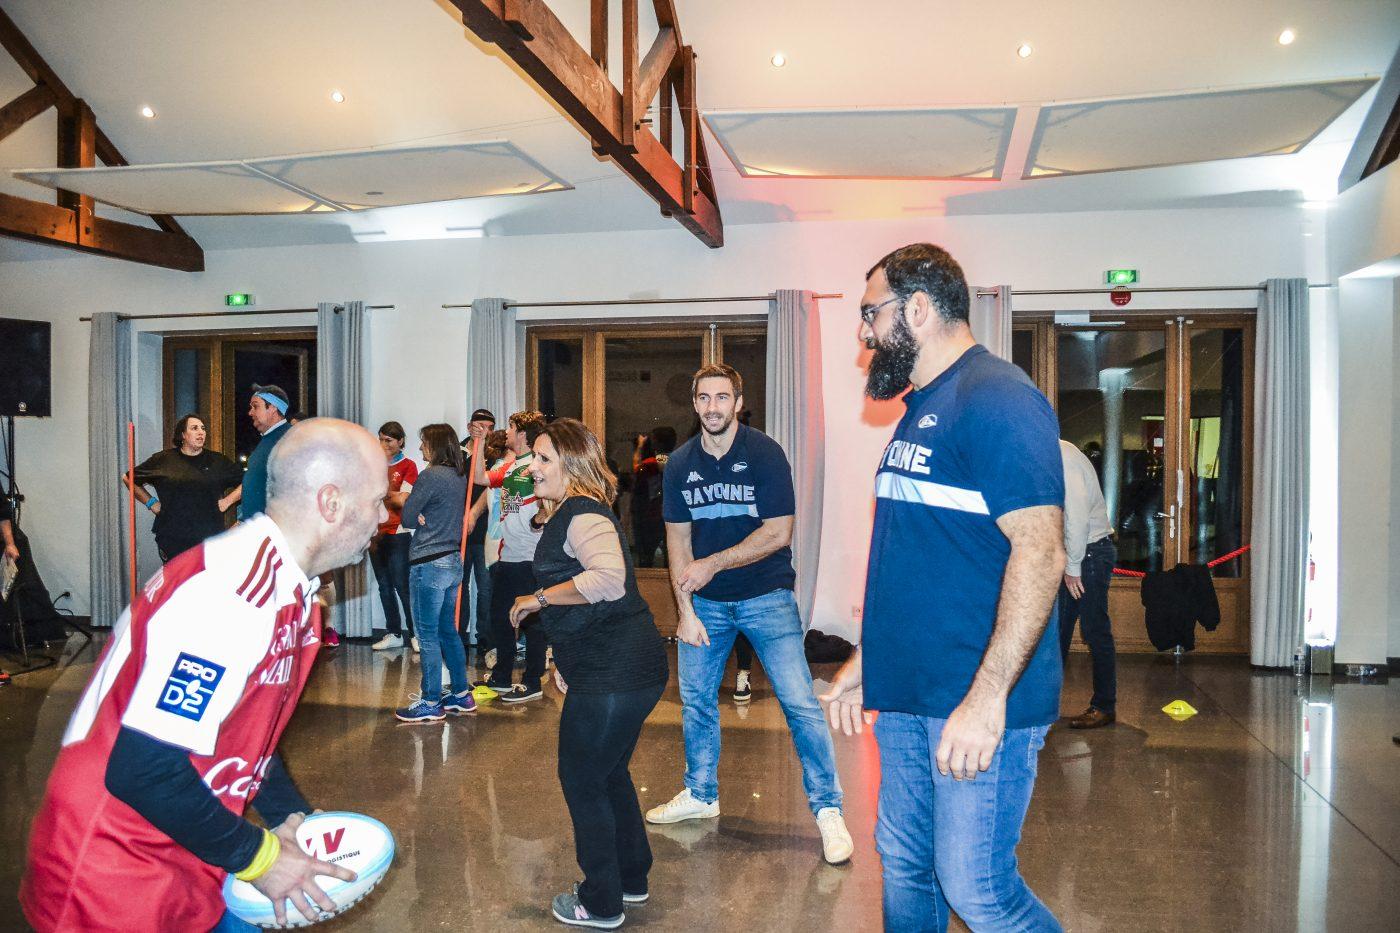 agence événementielle réceptive voyage pays basque erronda séminaire team building event Bayonne joueurs aviron rayonnais rugby